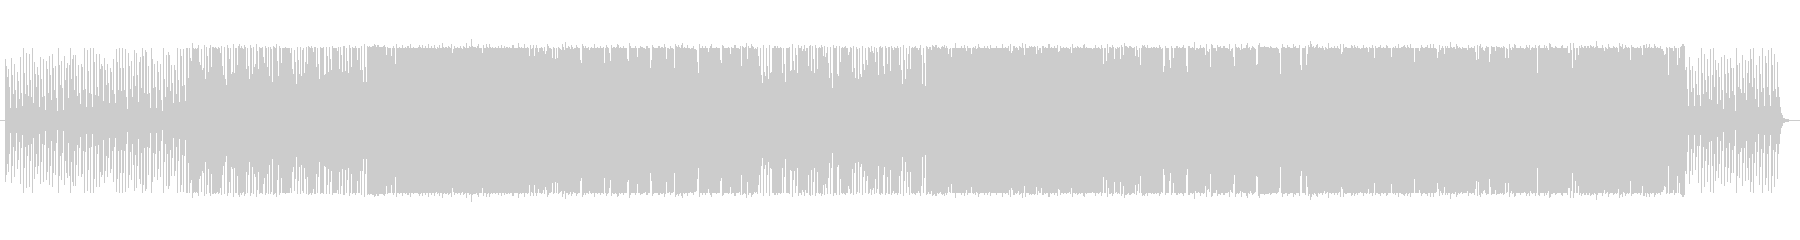 CMにオリエンタルなエレクトロの未再生の波形